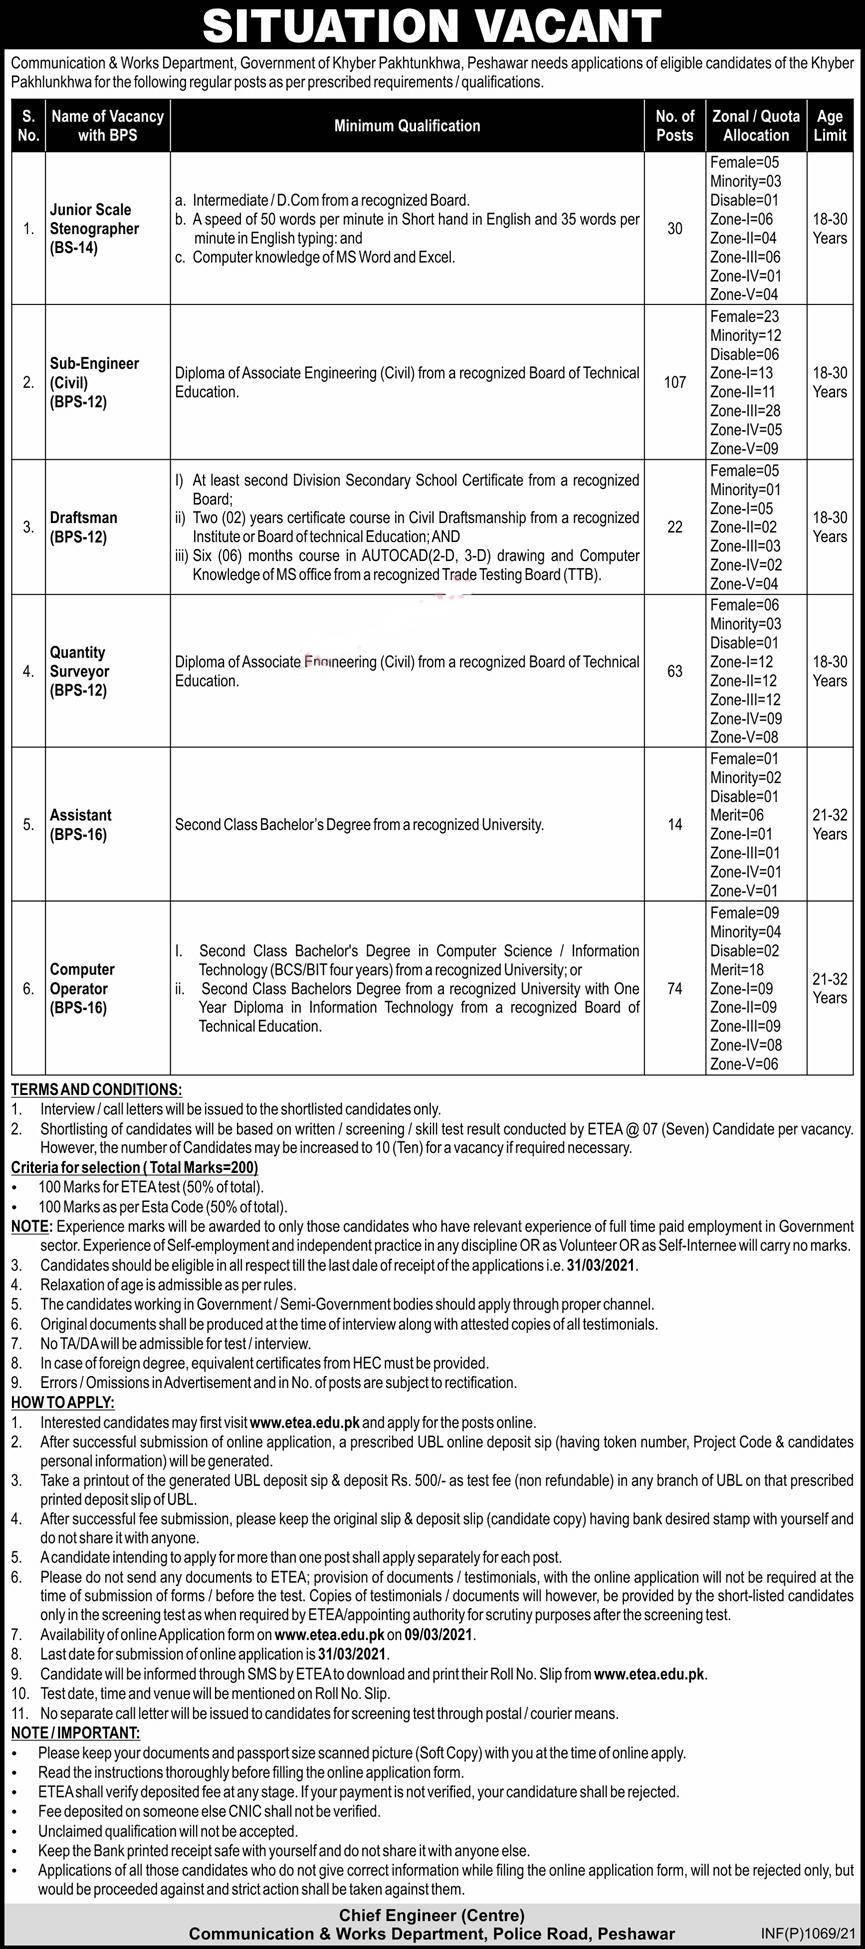 KPK Communication and Works Department ETEA Jobs 2021